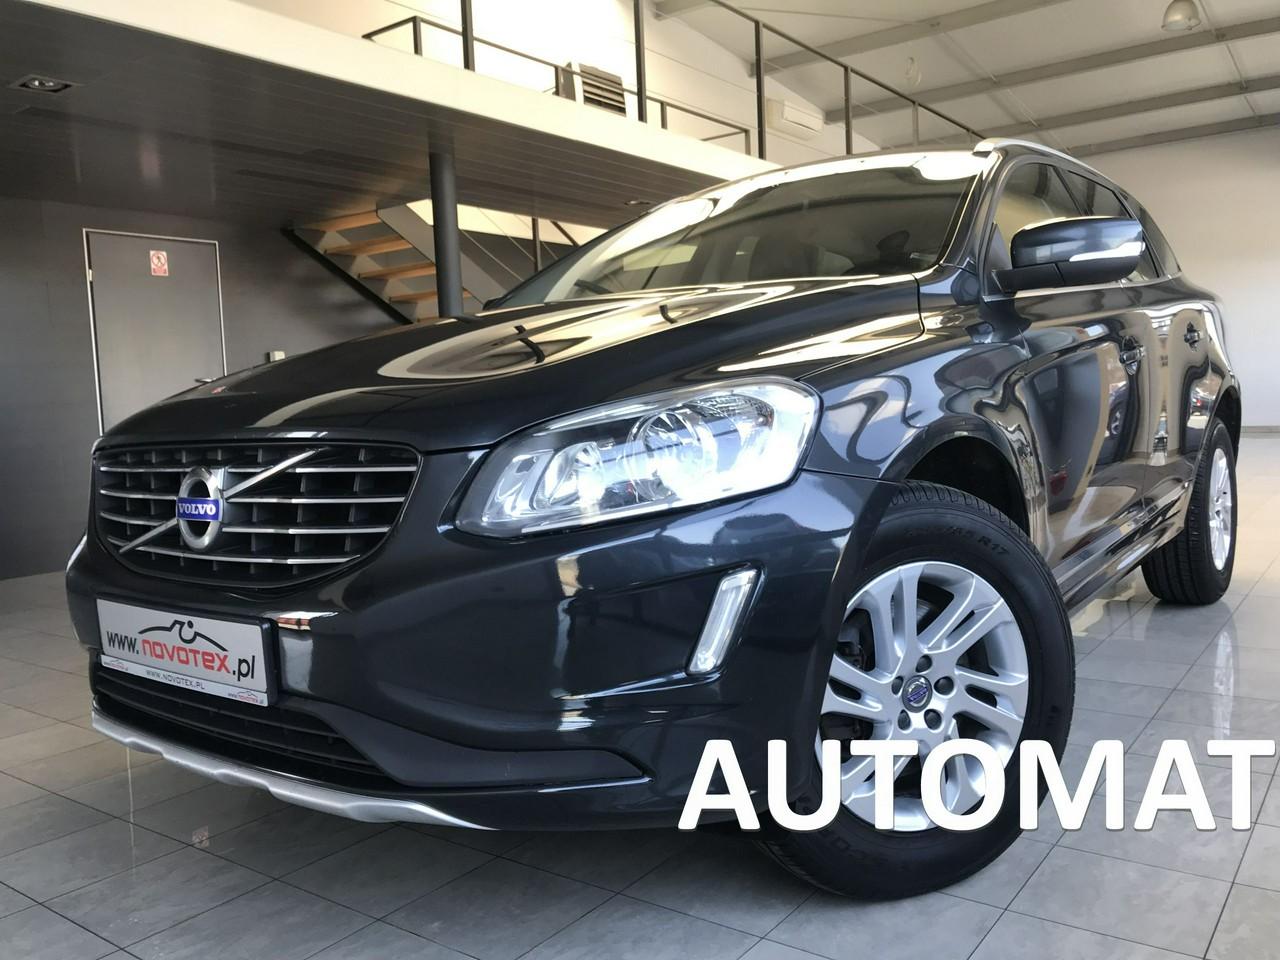 Volvo XC 60 D4*Momentum*automat*skóra*serwis w ASO Volvo*gwarancja VIP